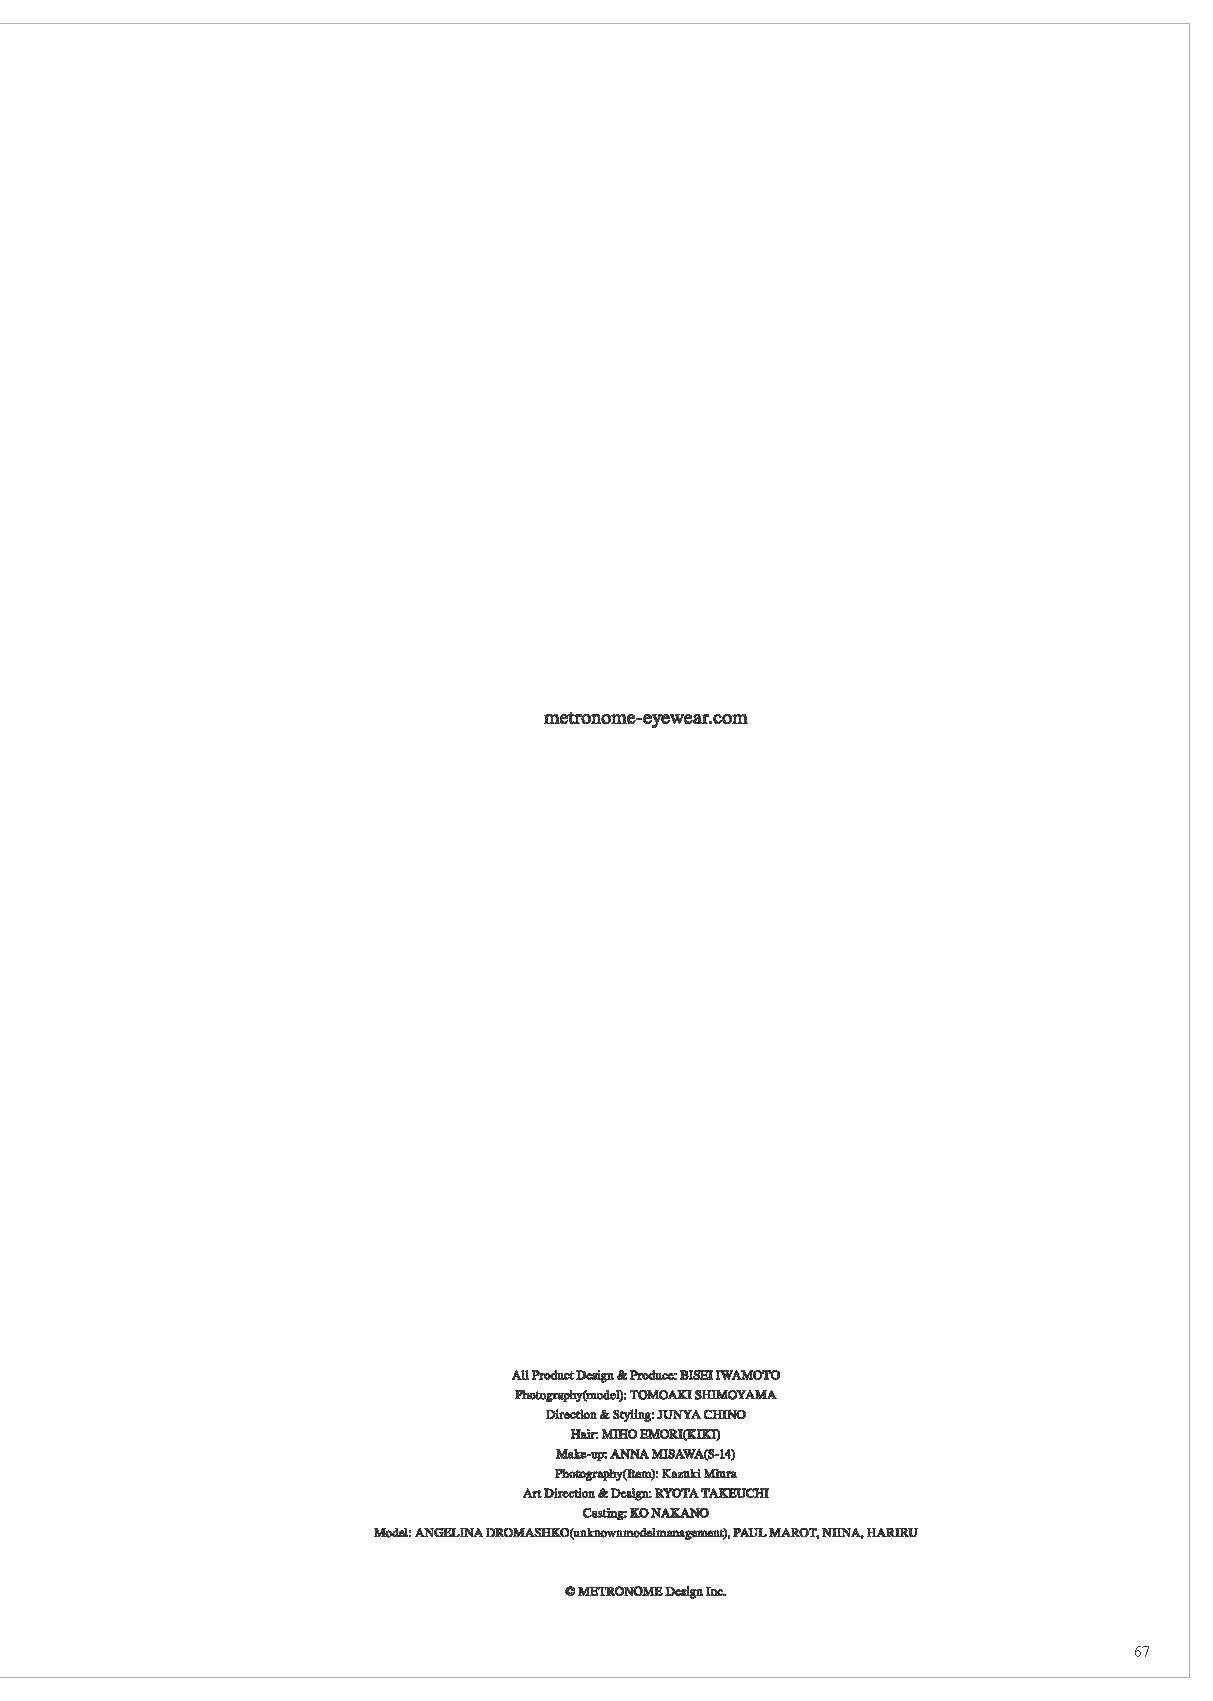 metronome catalog_Quadrophenia_本文2 修正後入稿用_ページ_67